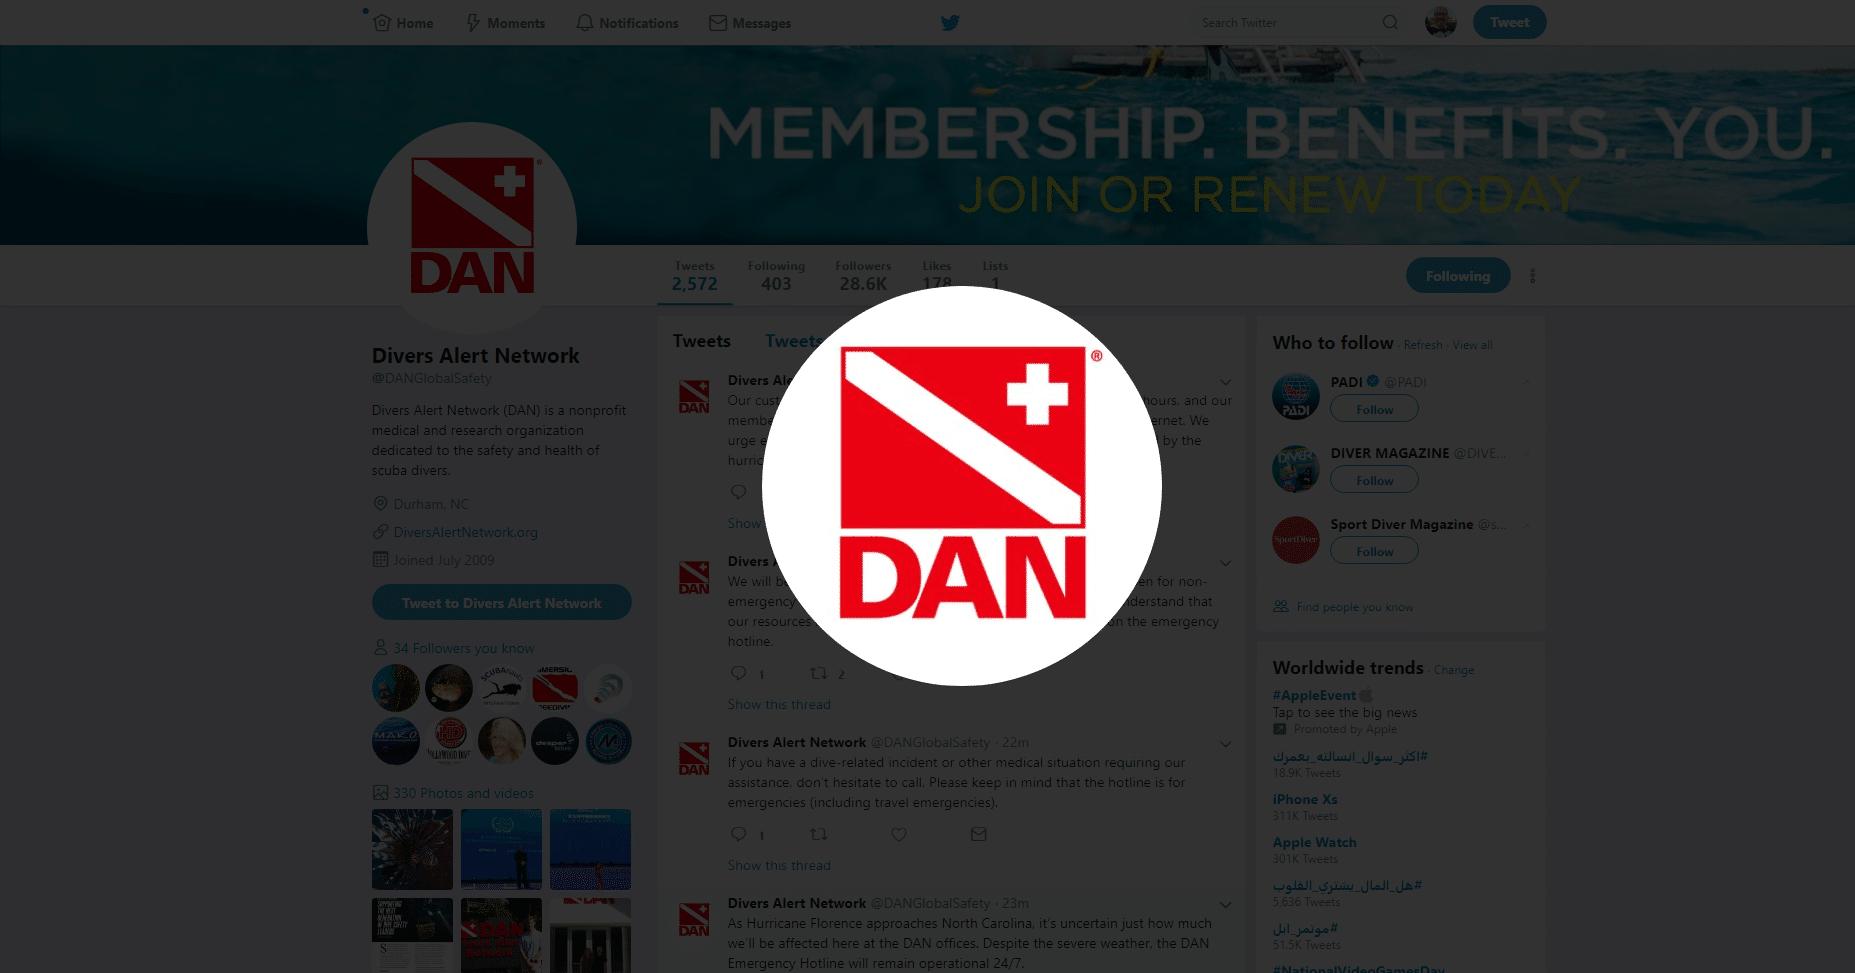 Despite Hurricane, DAN Emergency Hotline Will Be Operational 24/7